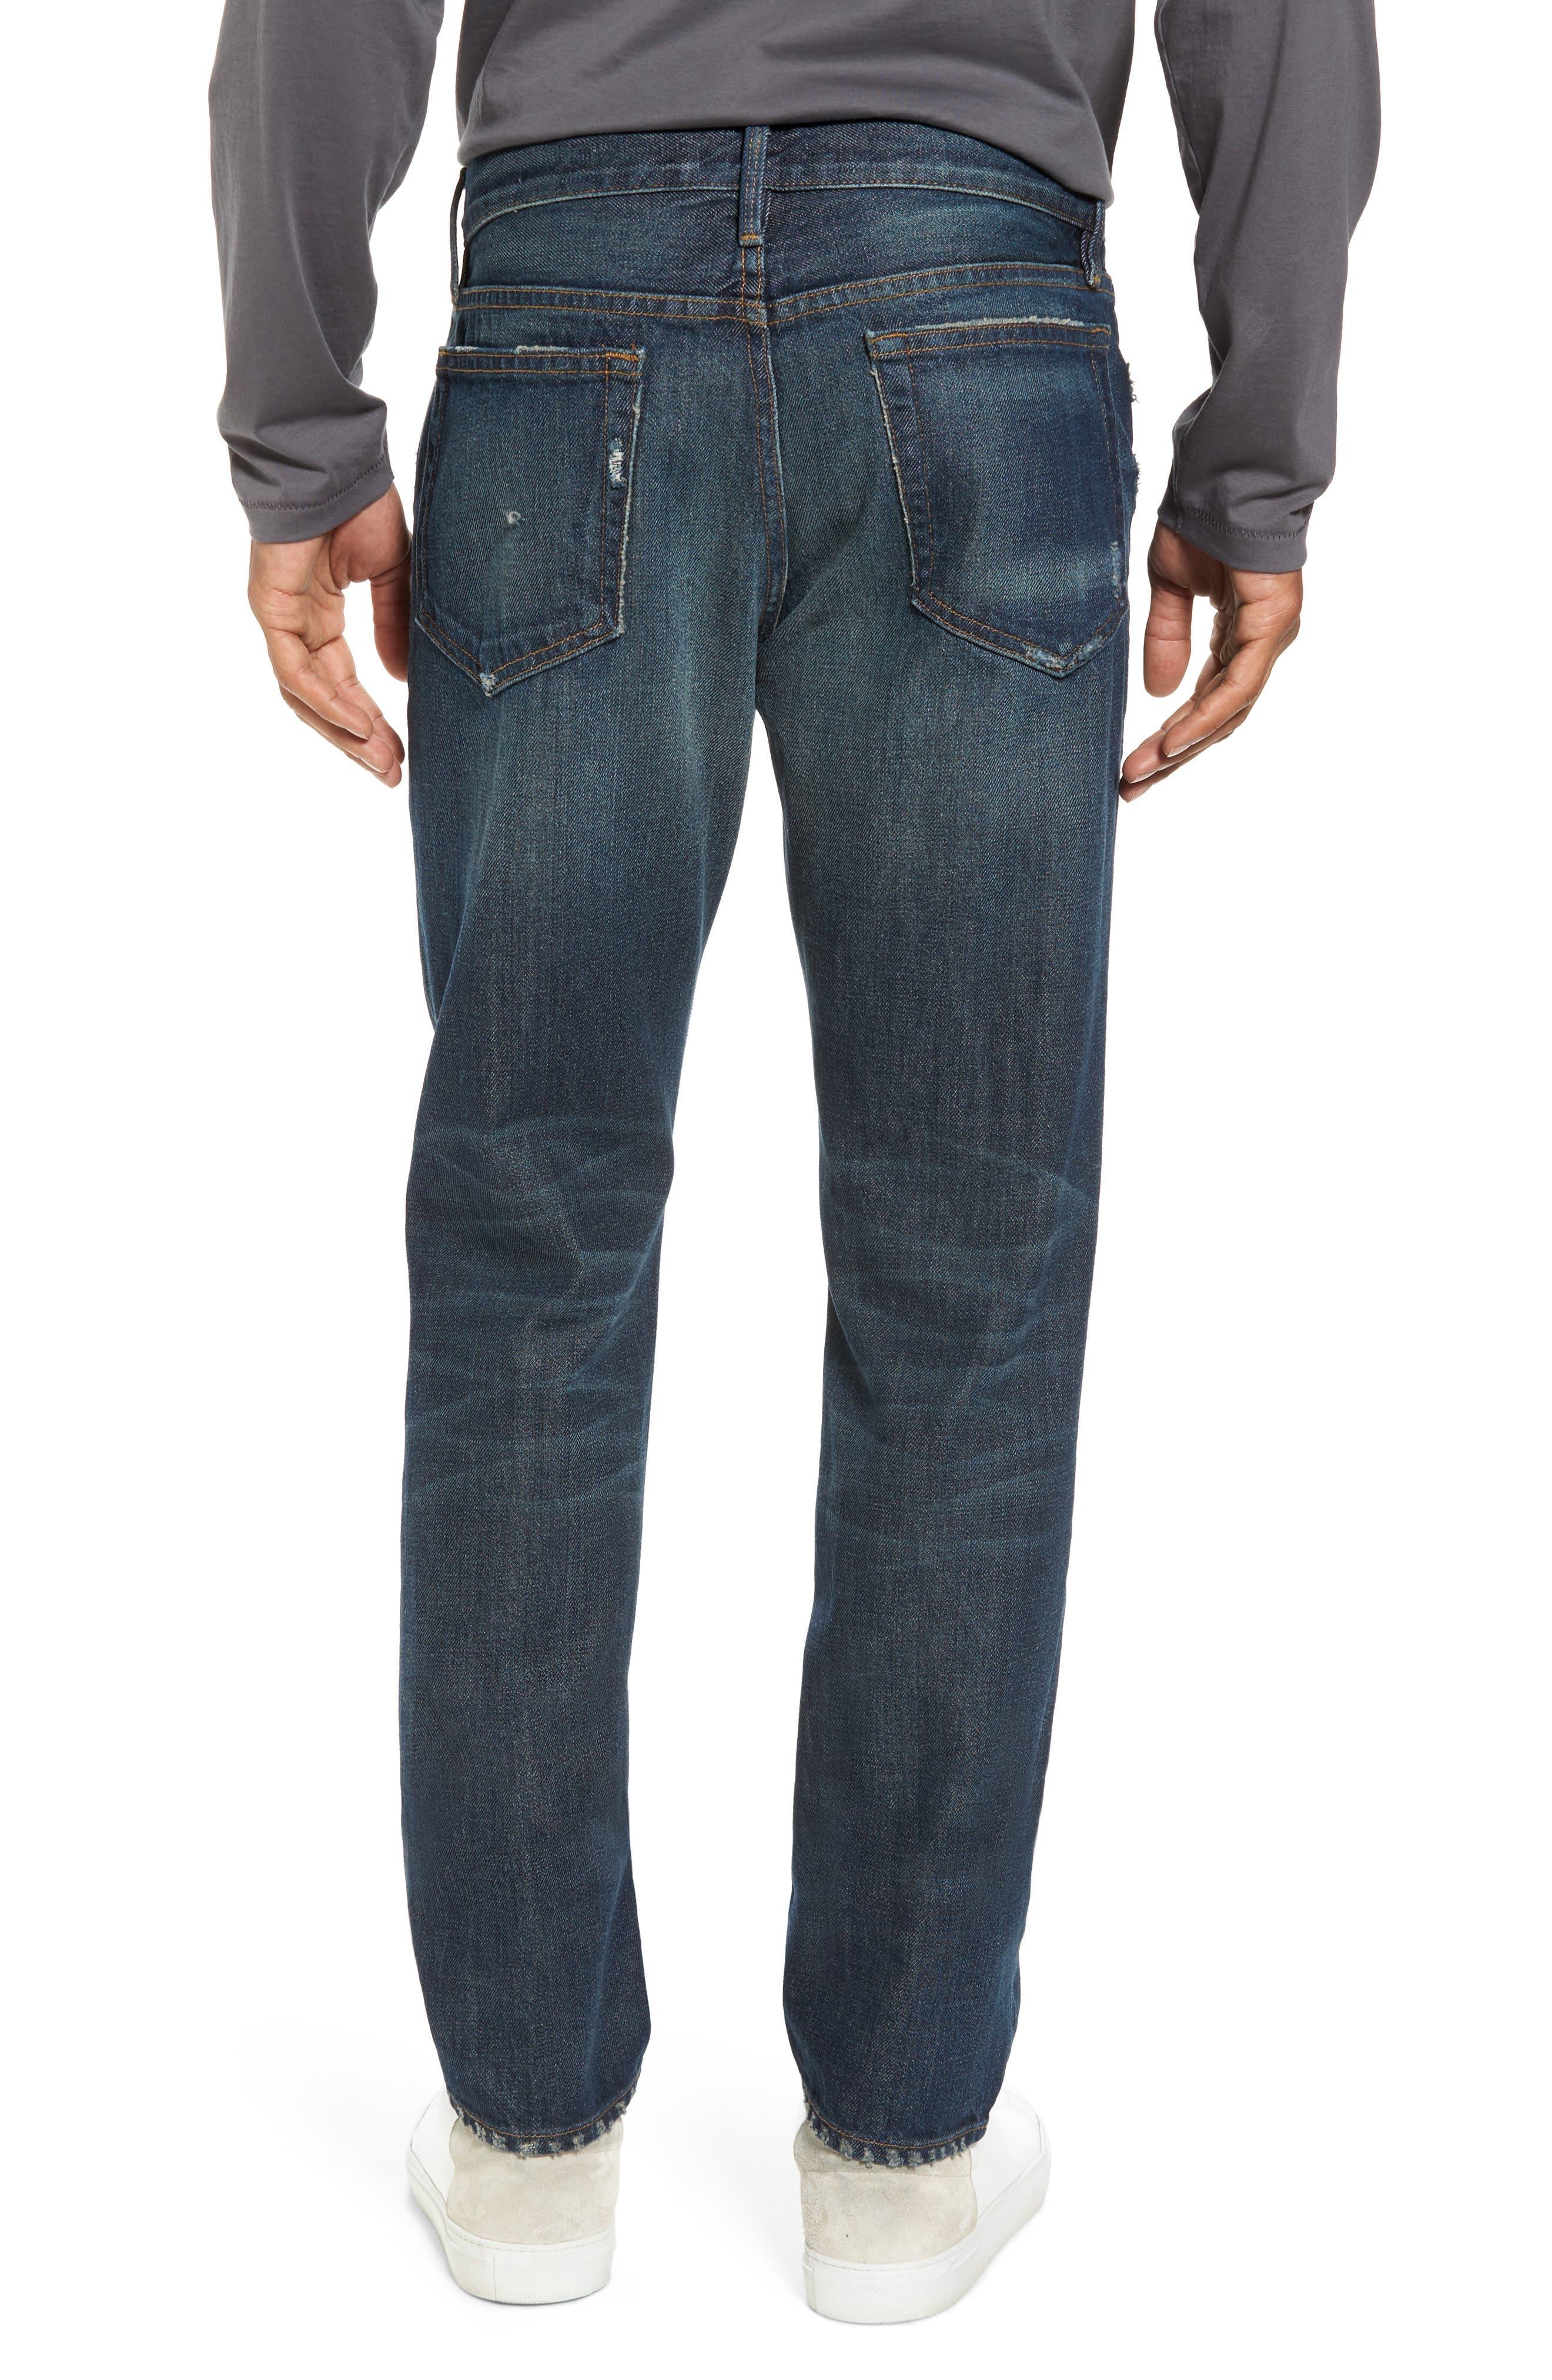 L'Homme Slim Fit Jeans,                             Alternate thumbnail 2, color,                             Bunker